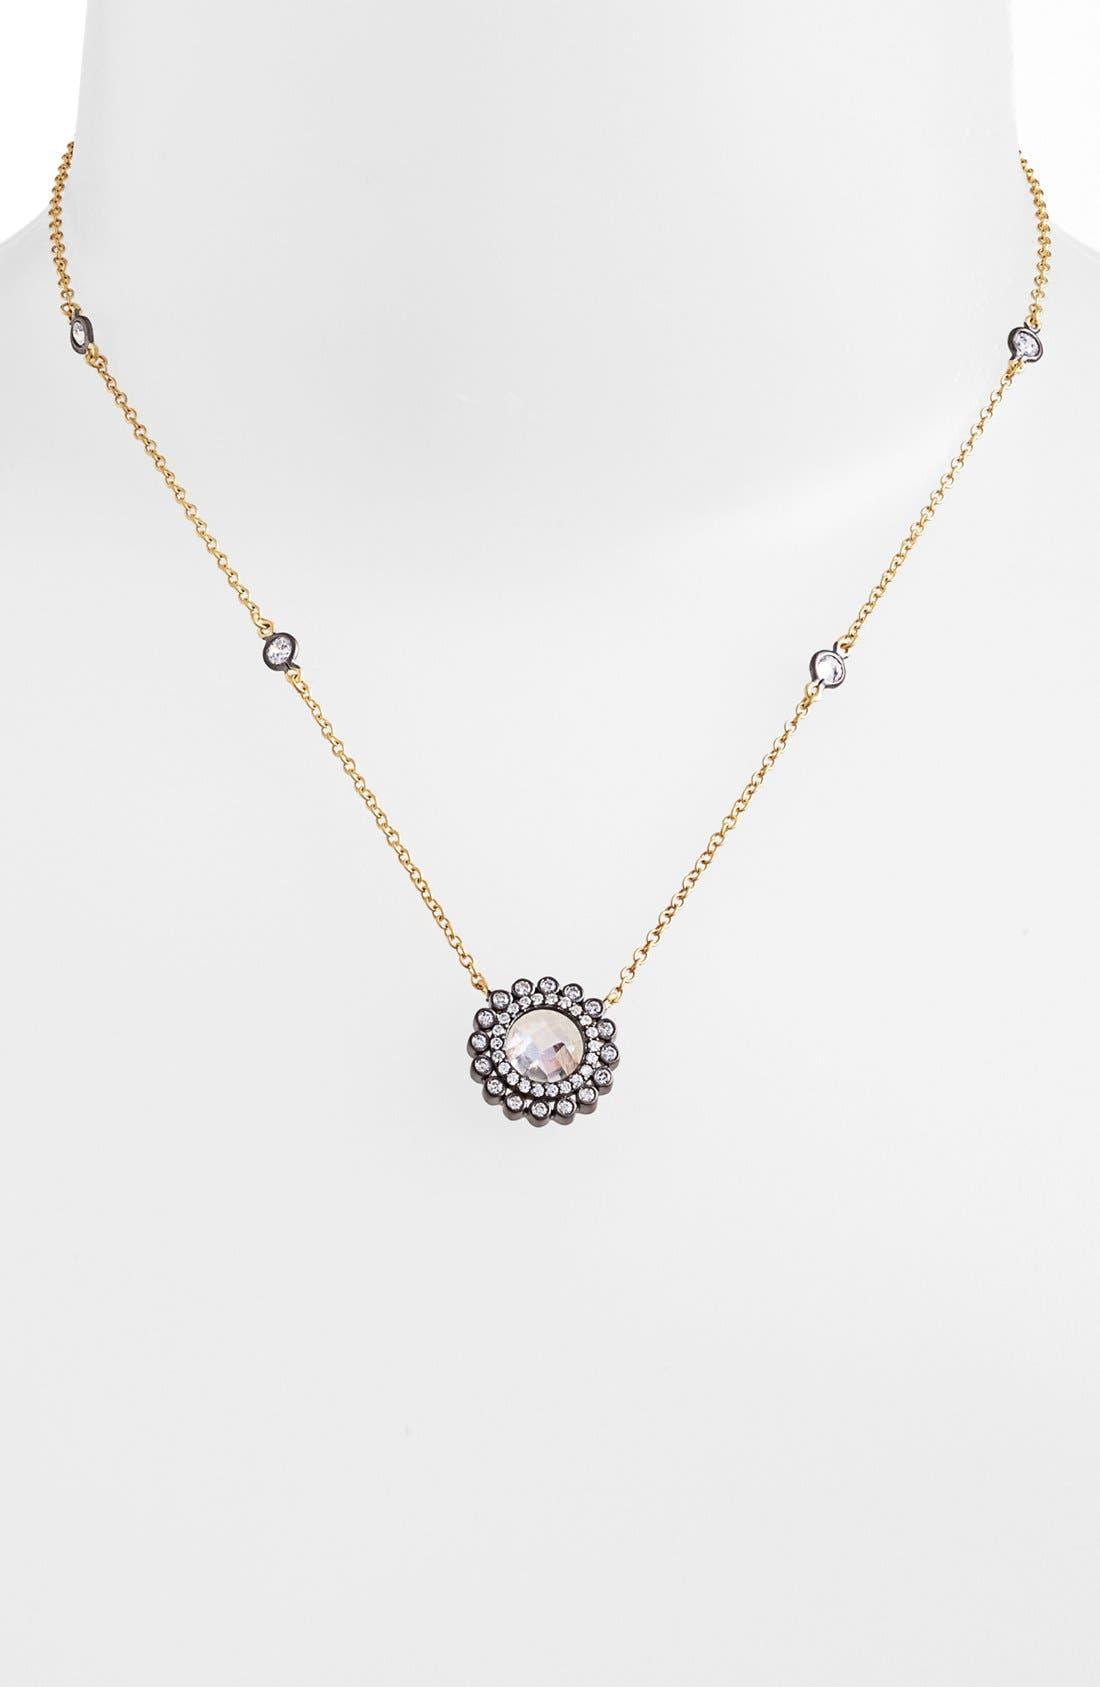 Main Image - FREIDA ROTHMAN 'Hamptons' Wildflower Pendant Necklace